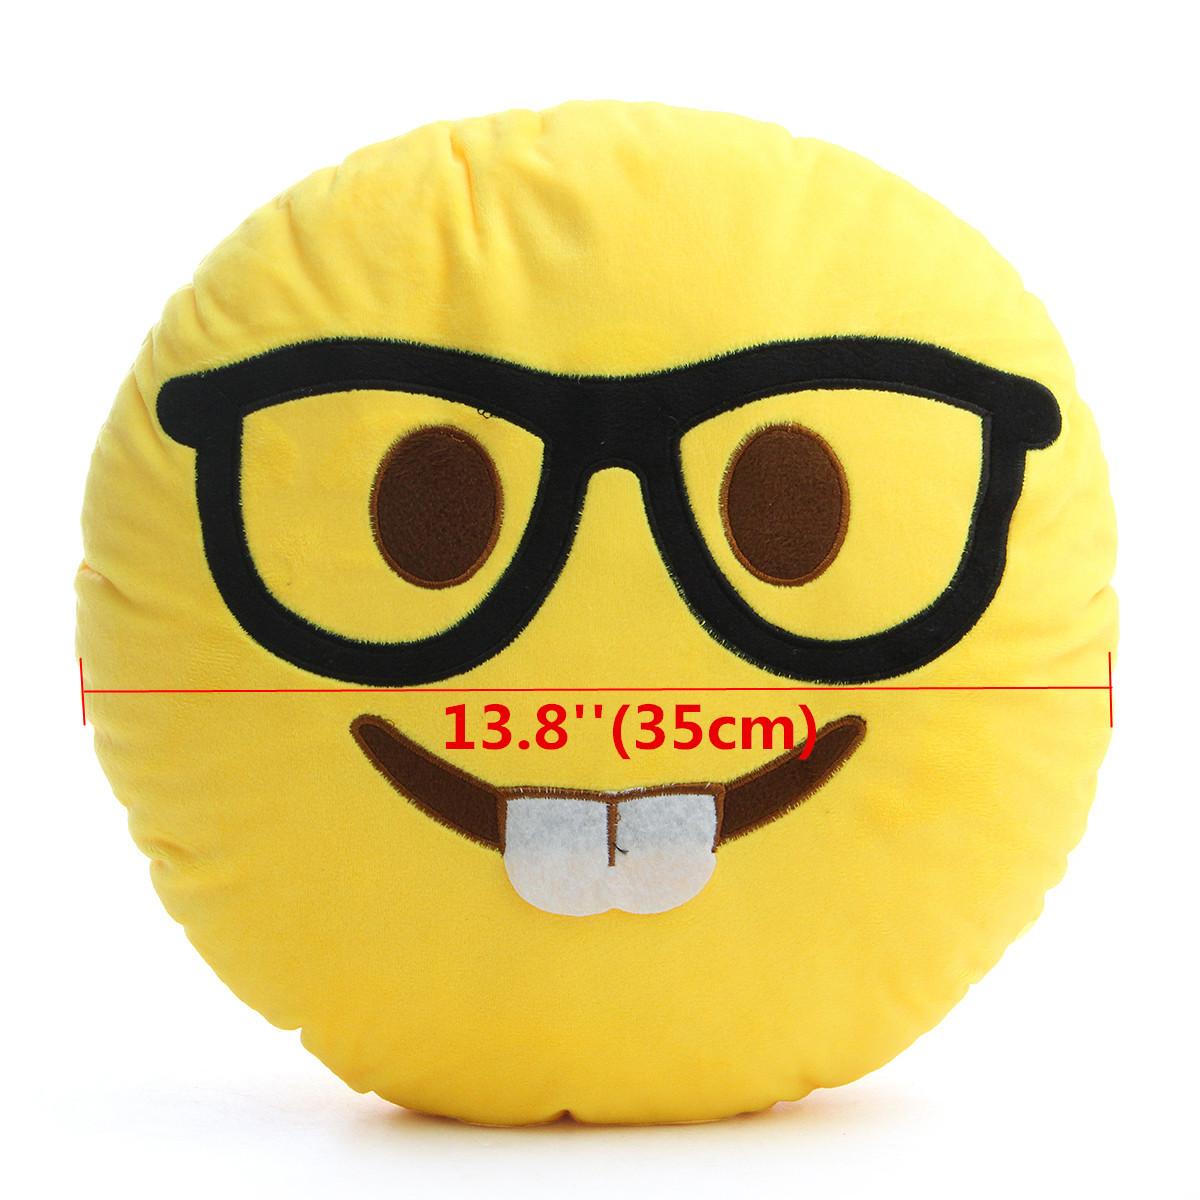 35CM Large Front Teeth Nerd Emoji Emoticon Plush PP Cotton Soft Toy - Photo: 6